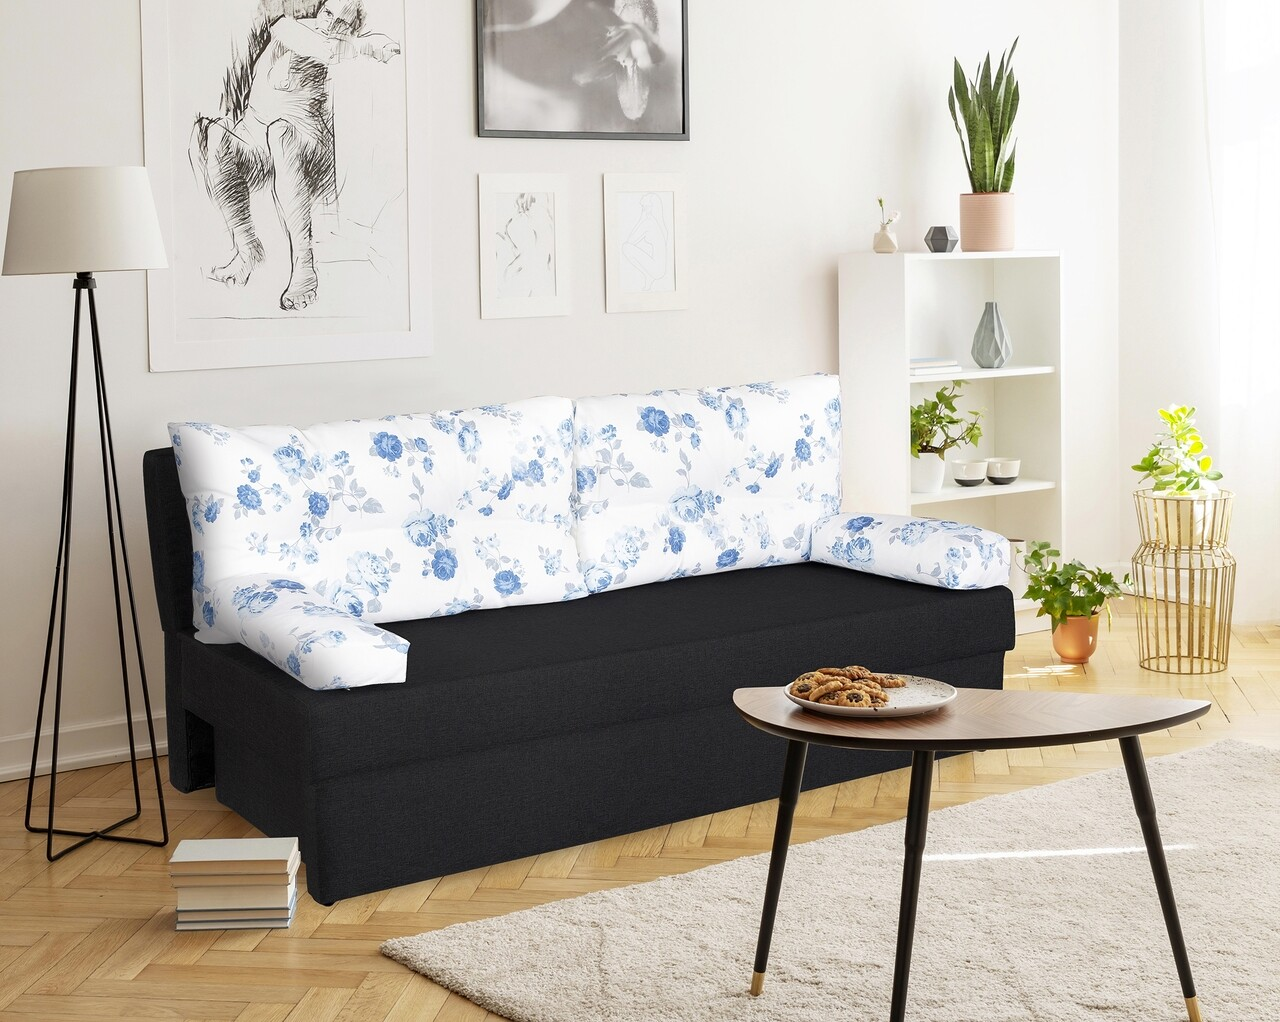 Canapea extensibila Alfi Anthracite 192x80x77 cm cu lada de depozitare, Blue Anemone